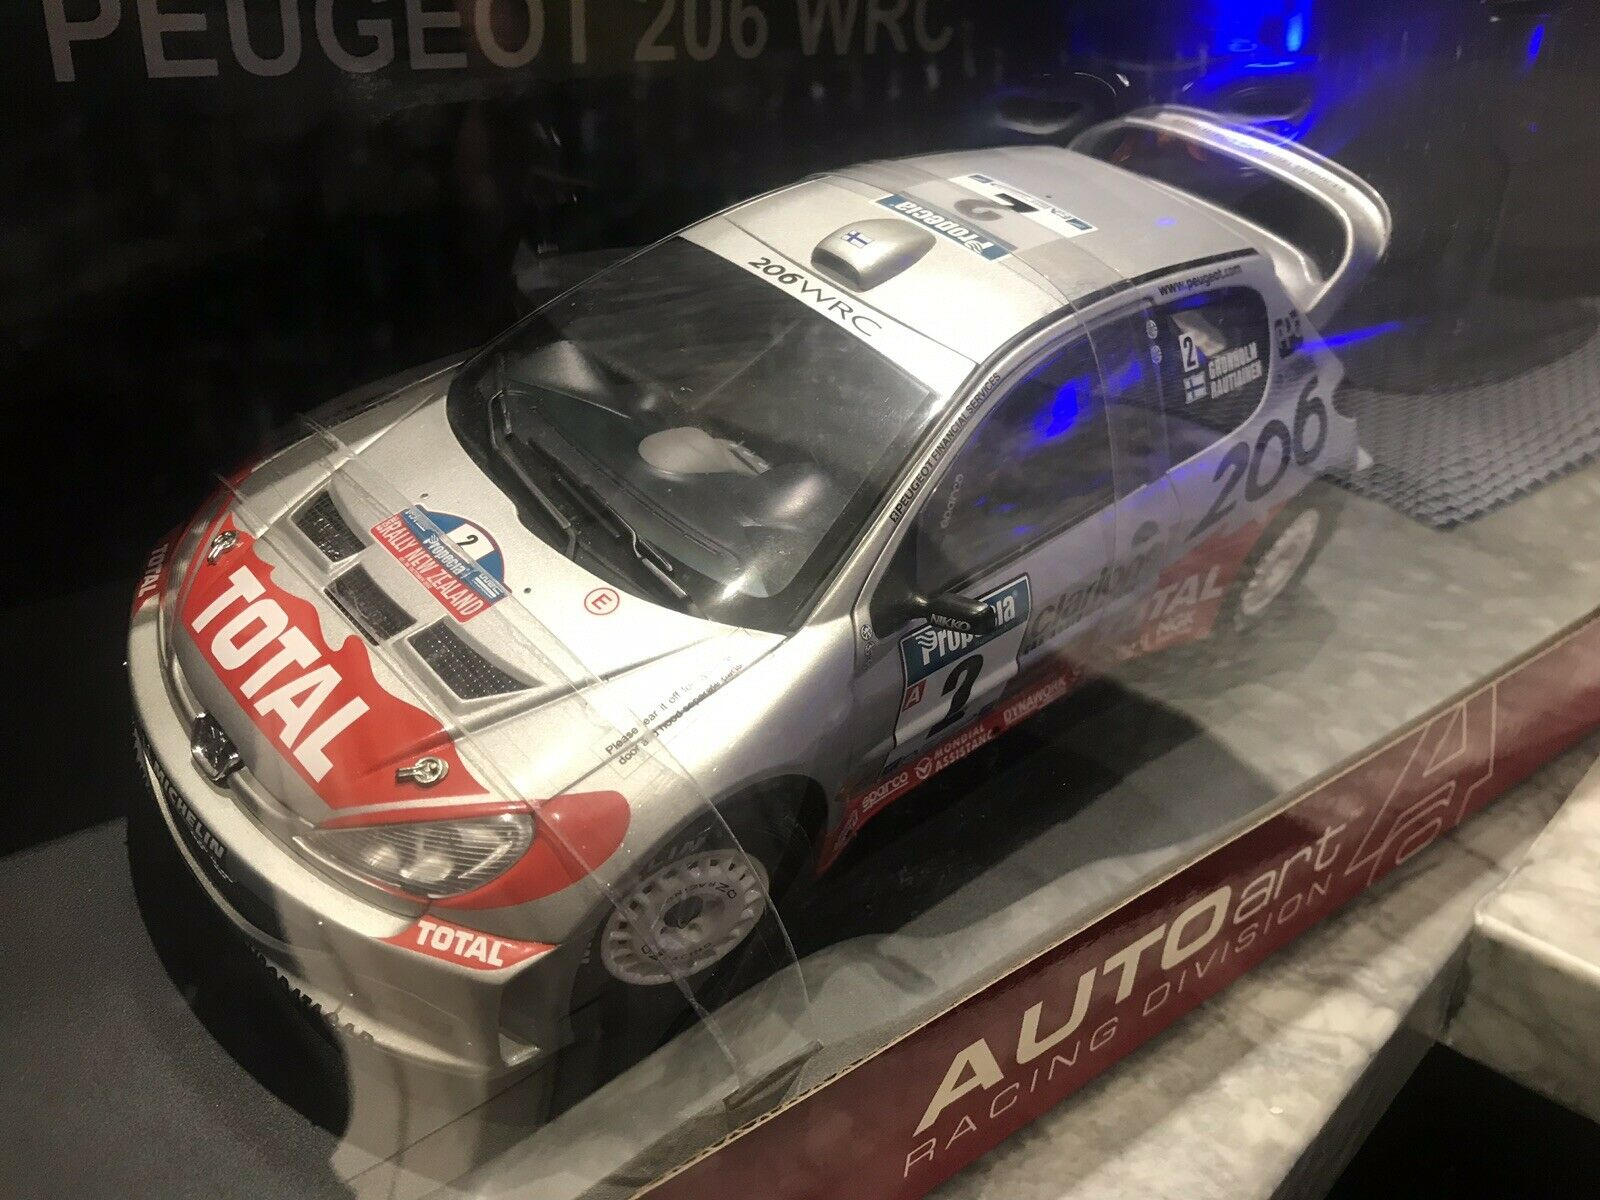 mejor vendido 1 1 1 18 Autoart Peugeot 206 WRC 2002 M. GRONHOLM T. Rautiainen  2 ganador Nueva Zelanda  exclusivo